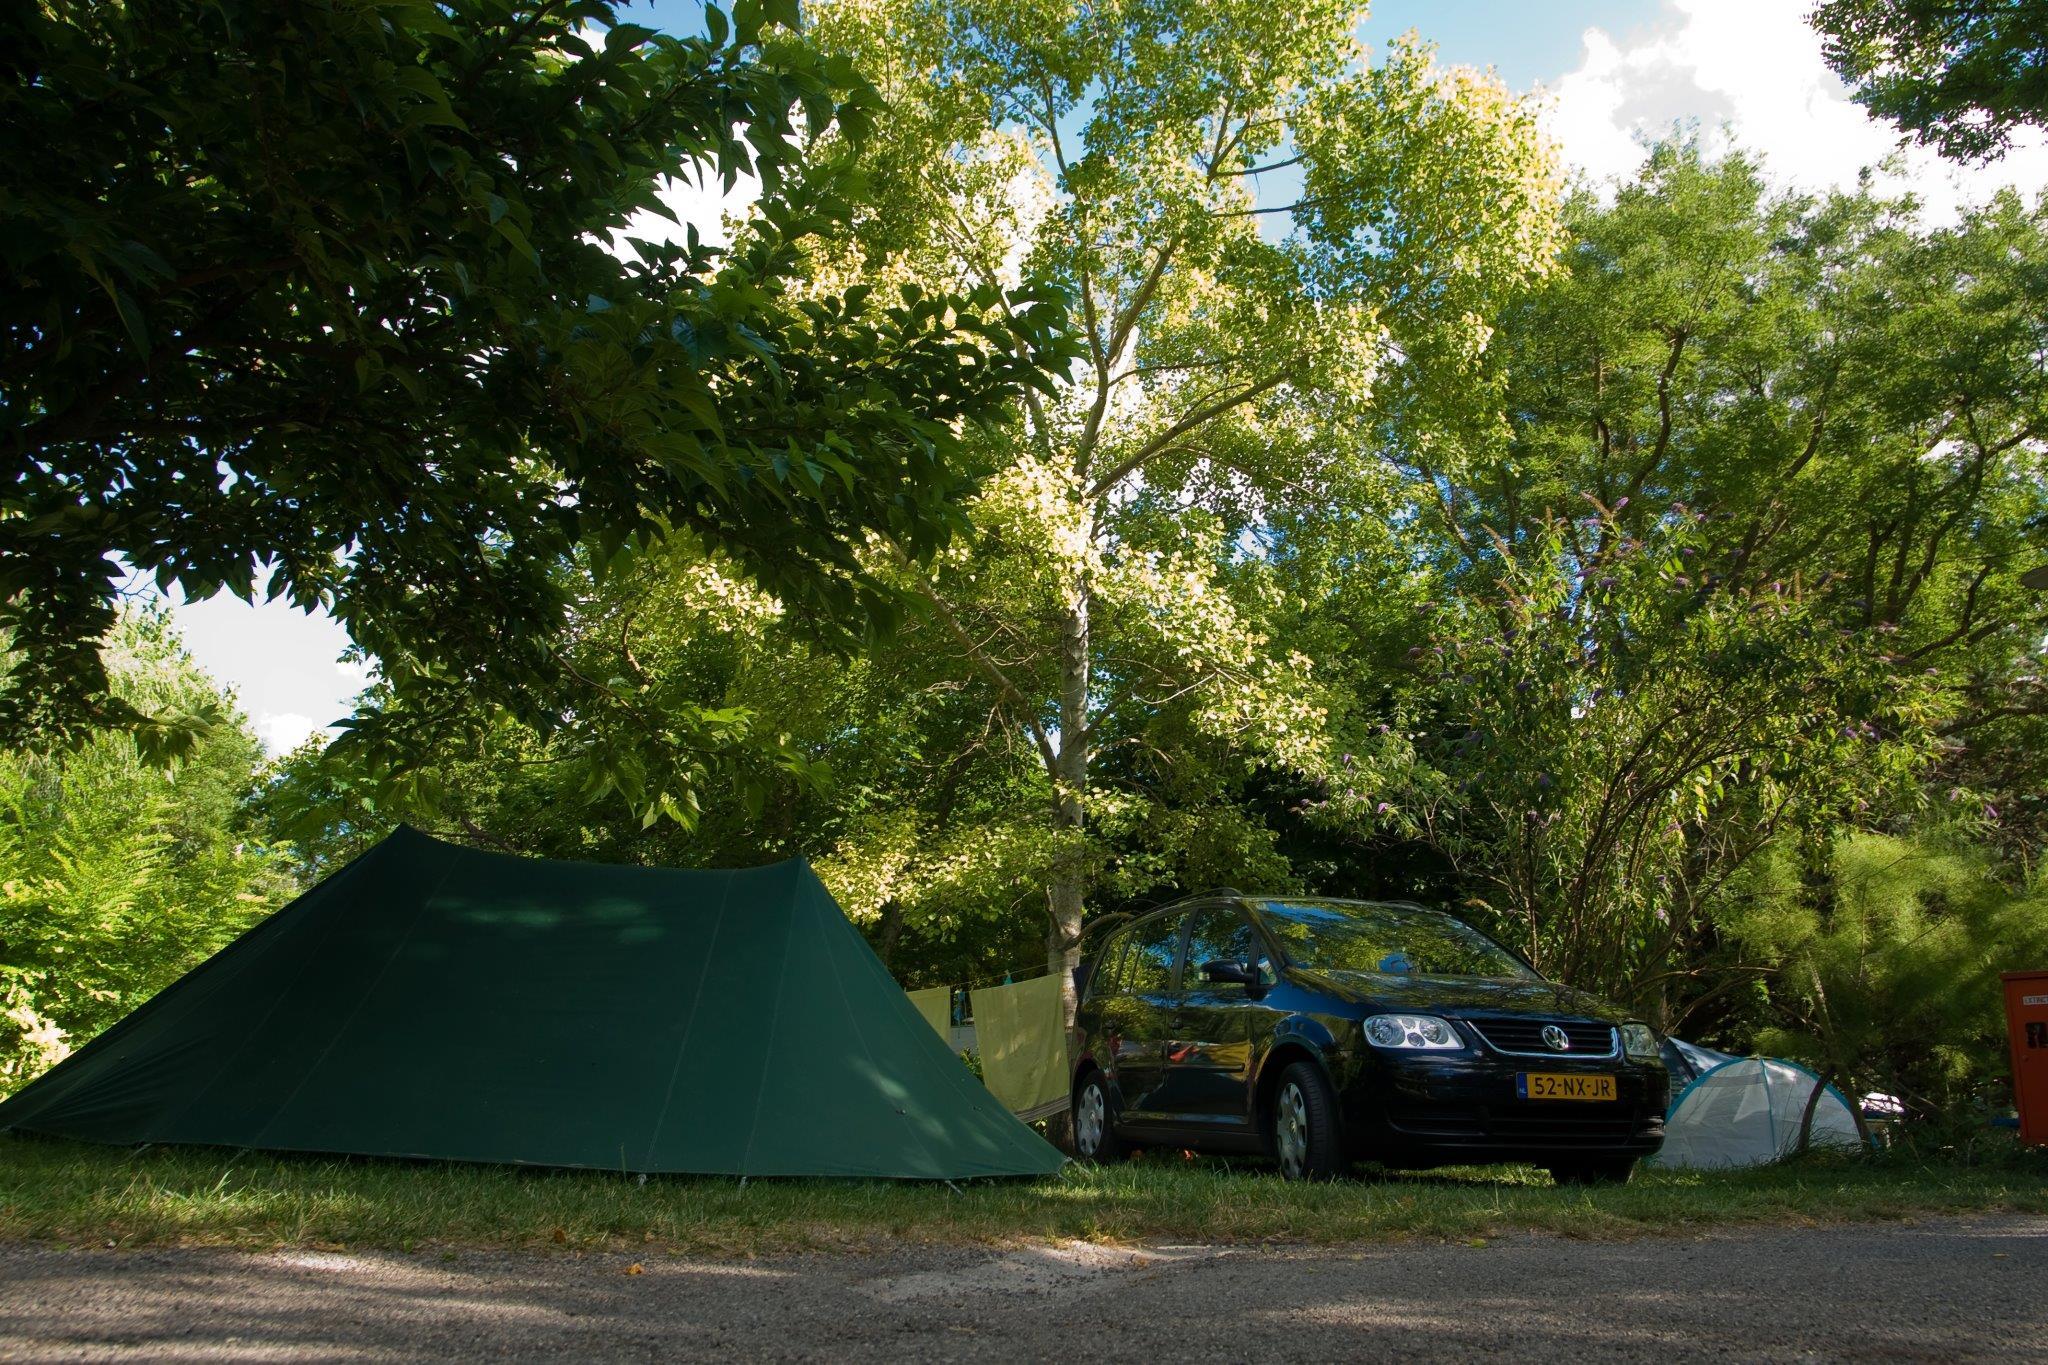 Kampeerplaats tent, caravan of camper